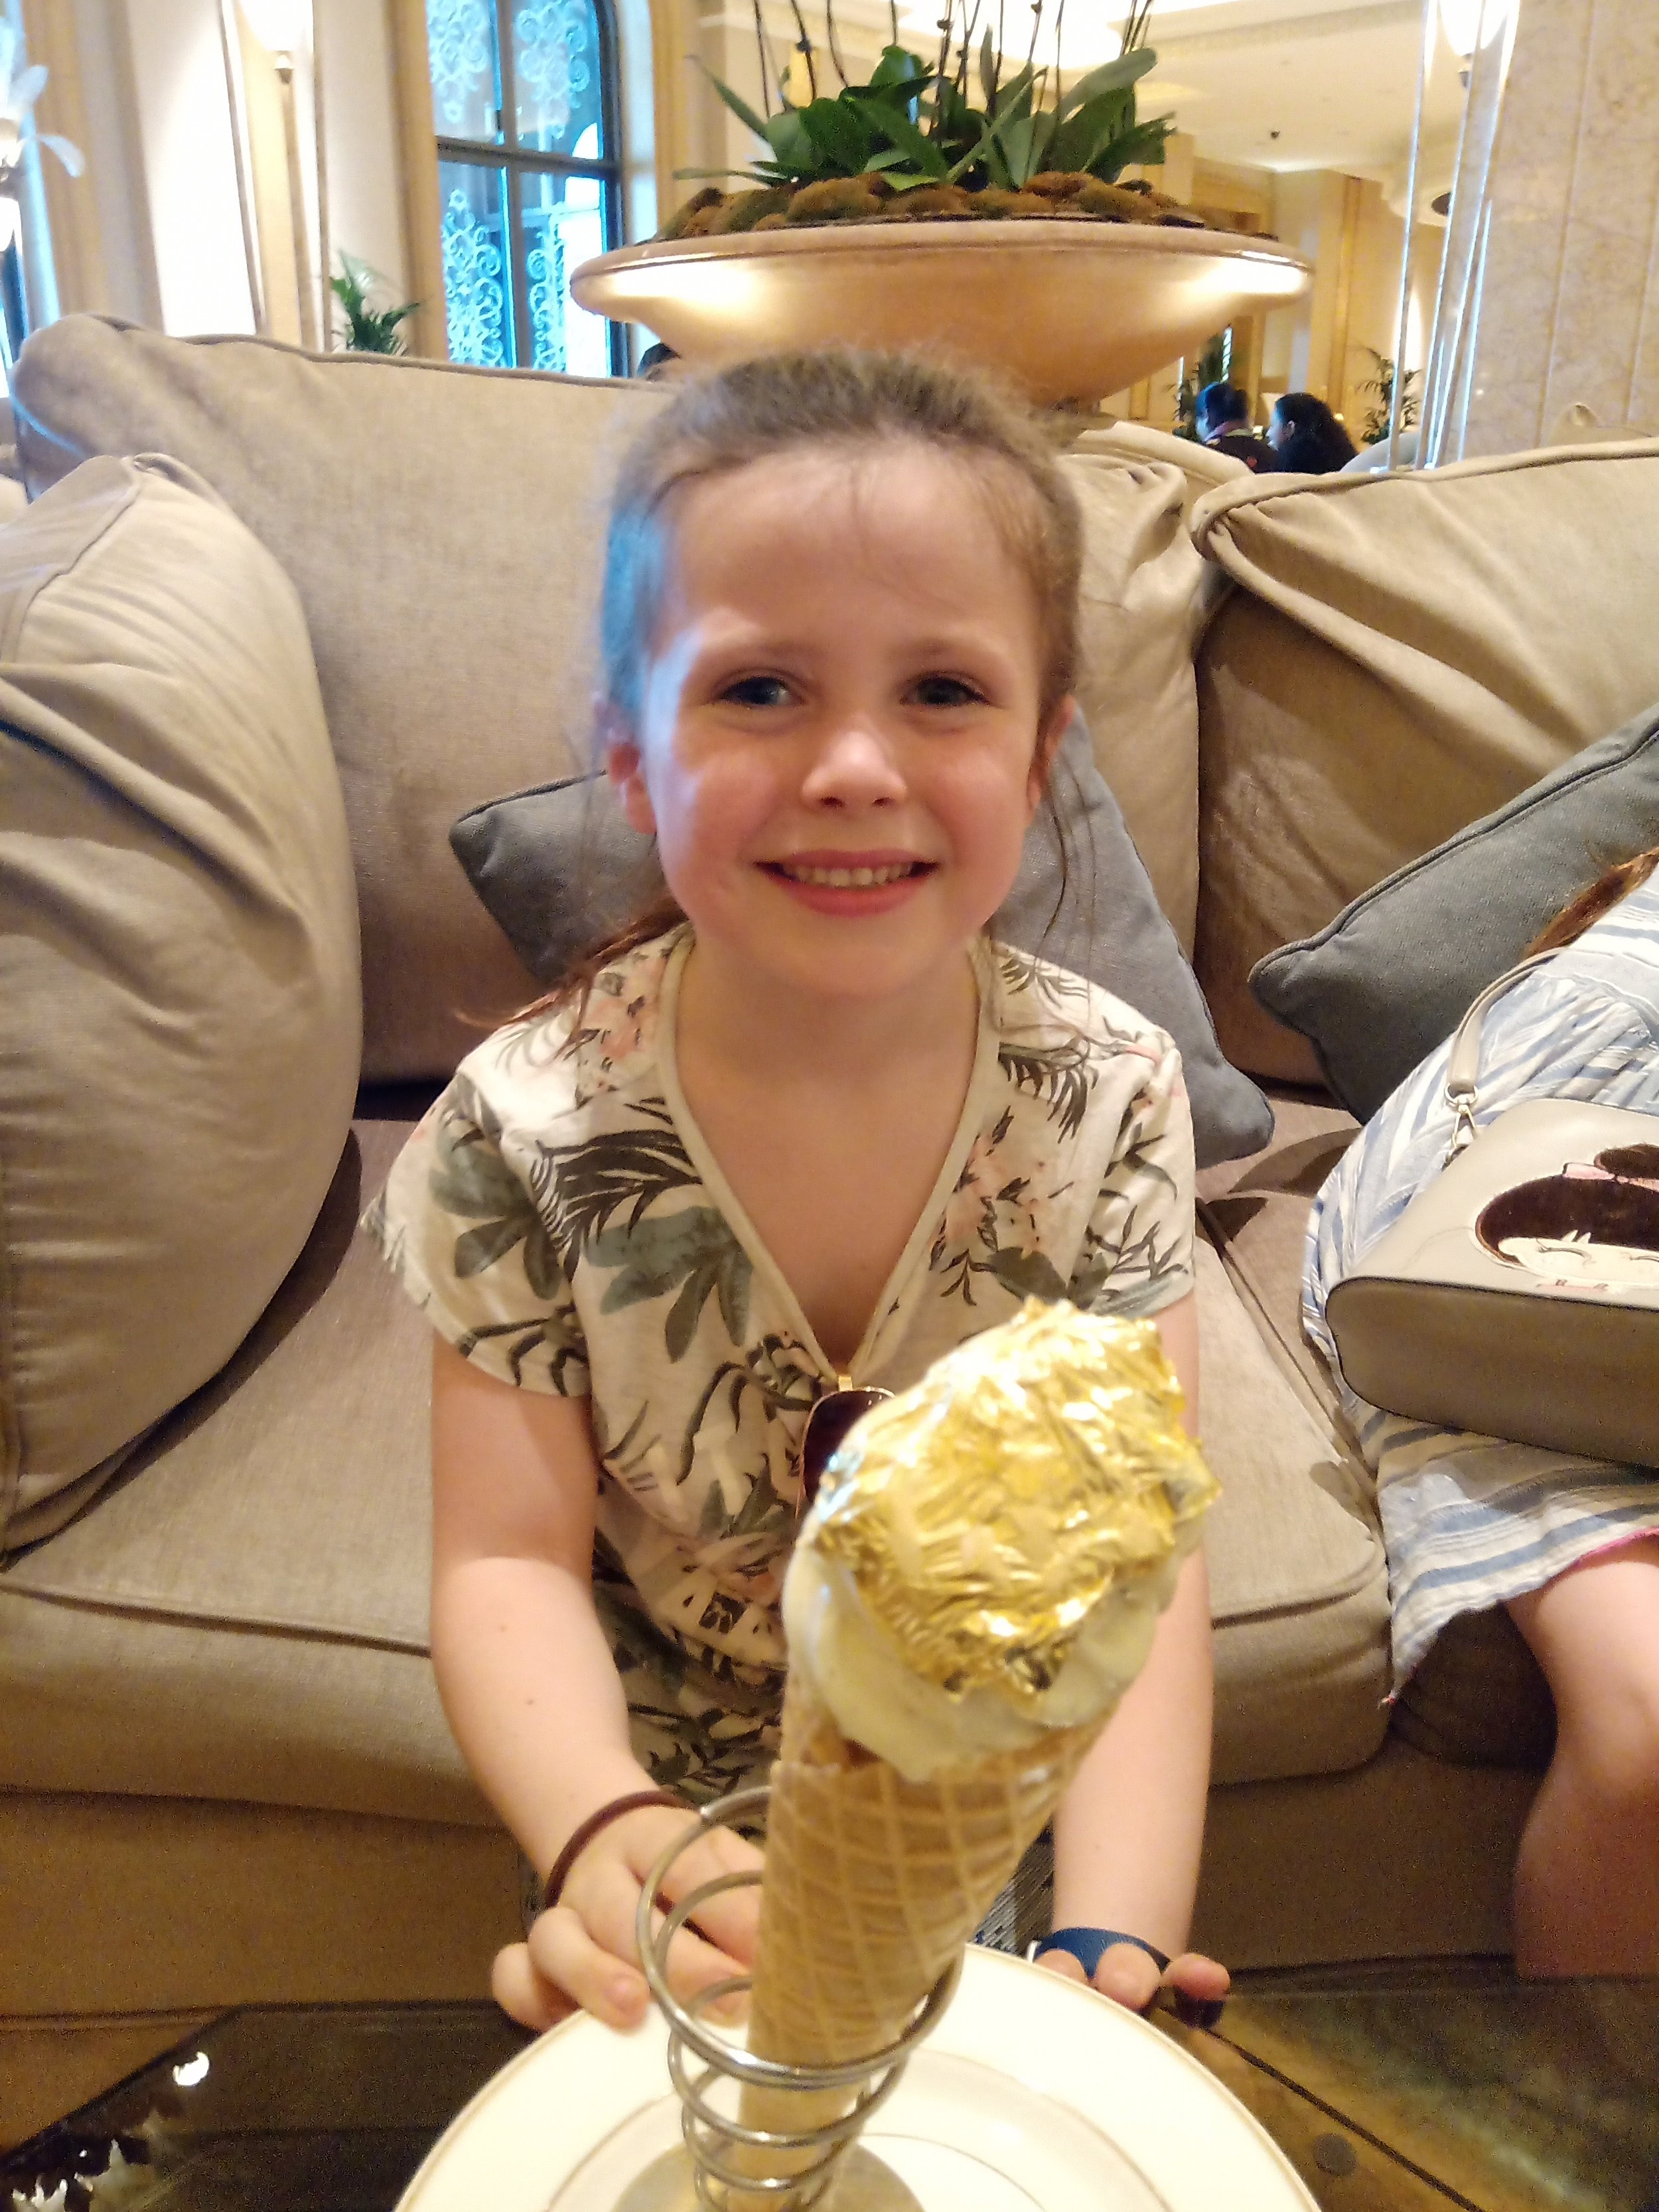 Emmy semi-enjoying her ostentatious dessert